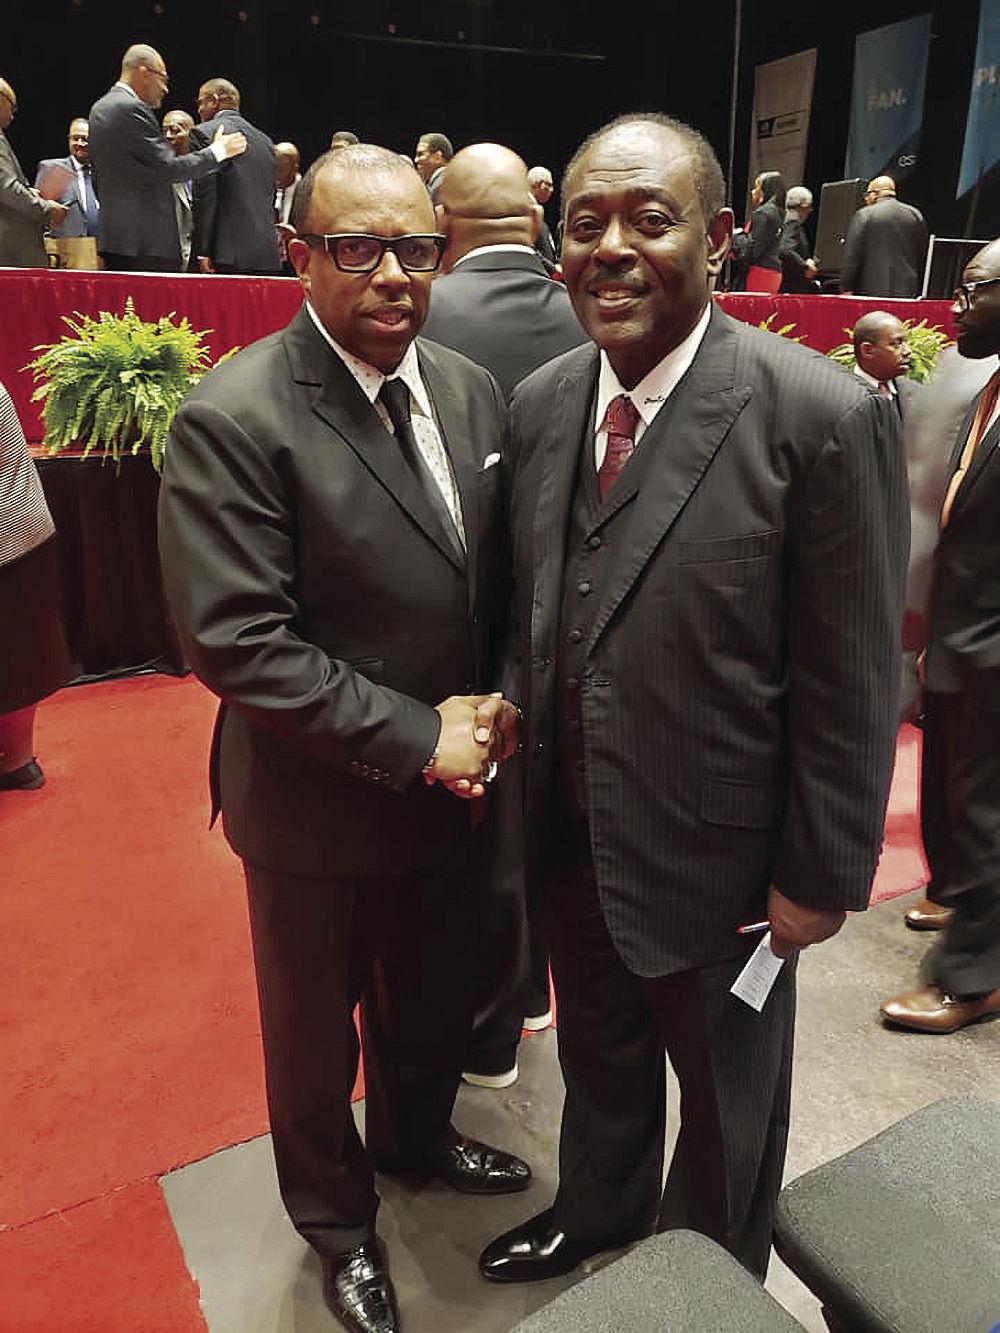 Reverend Carl Johnson and Reverend C.P. Preston Jr.